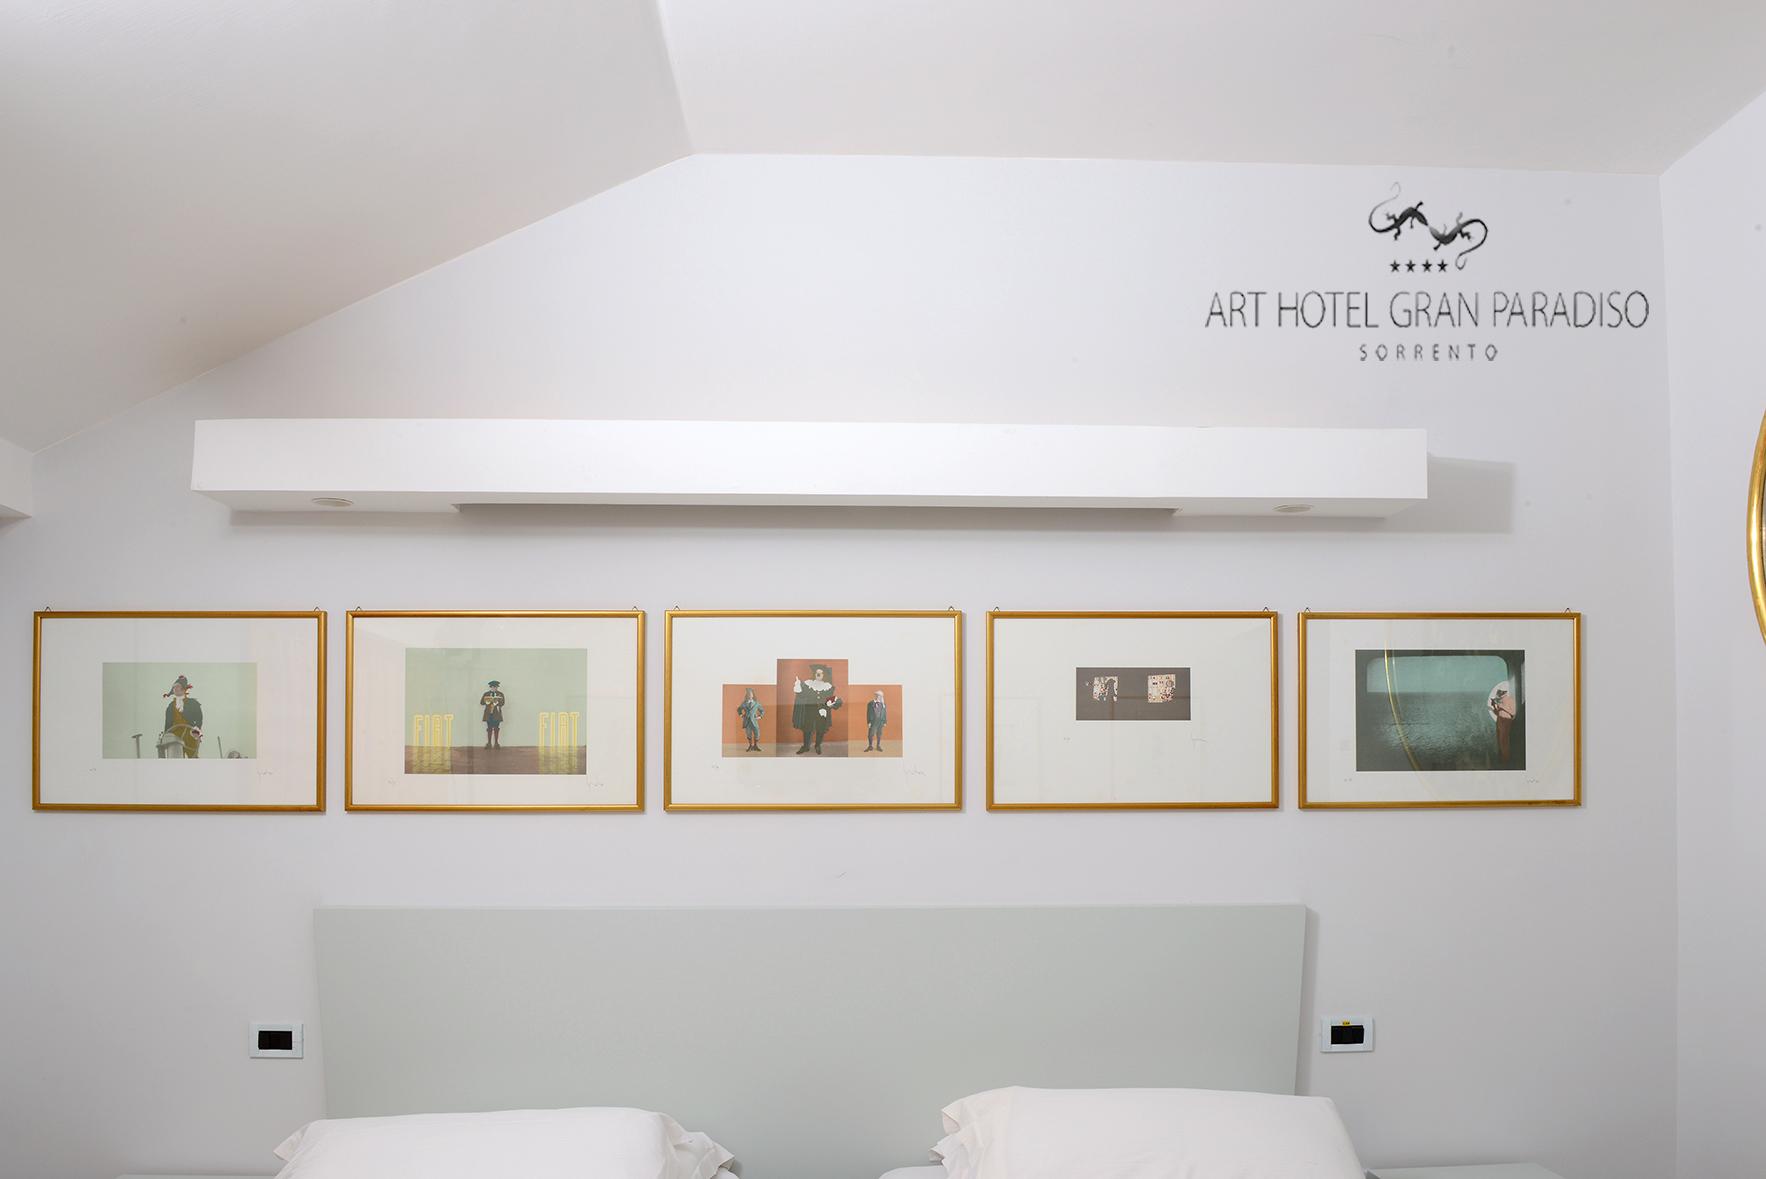 Art_Hotel_Gran_Paradiso_2013_411_Luigi_Ontani_1.jpg